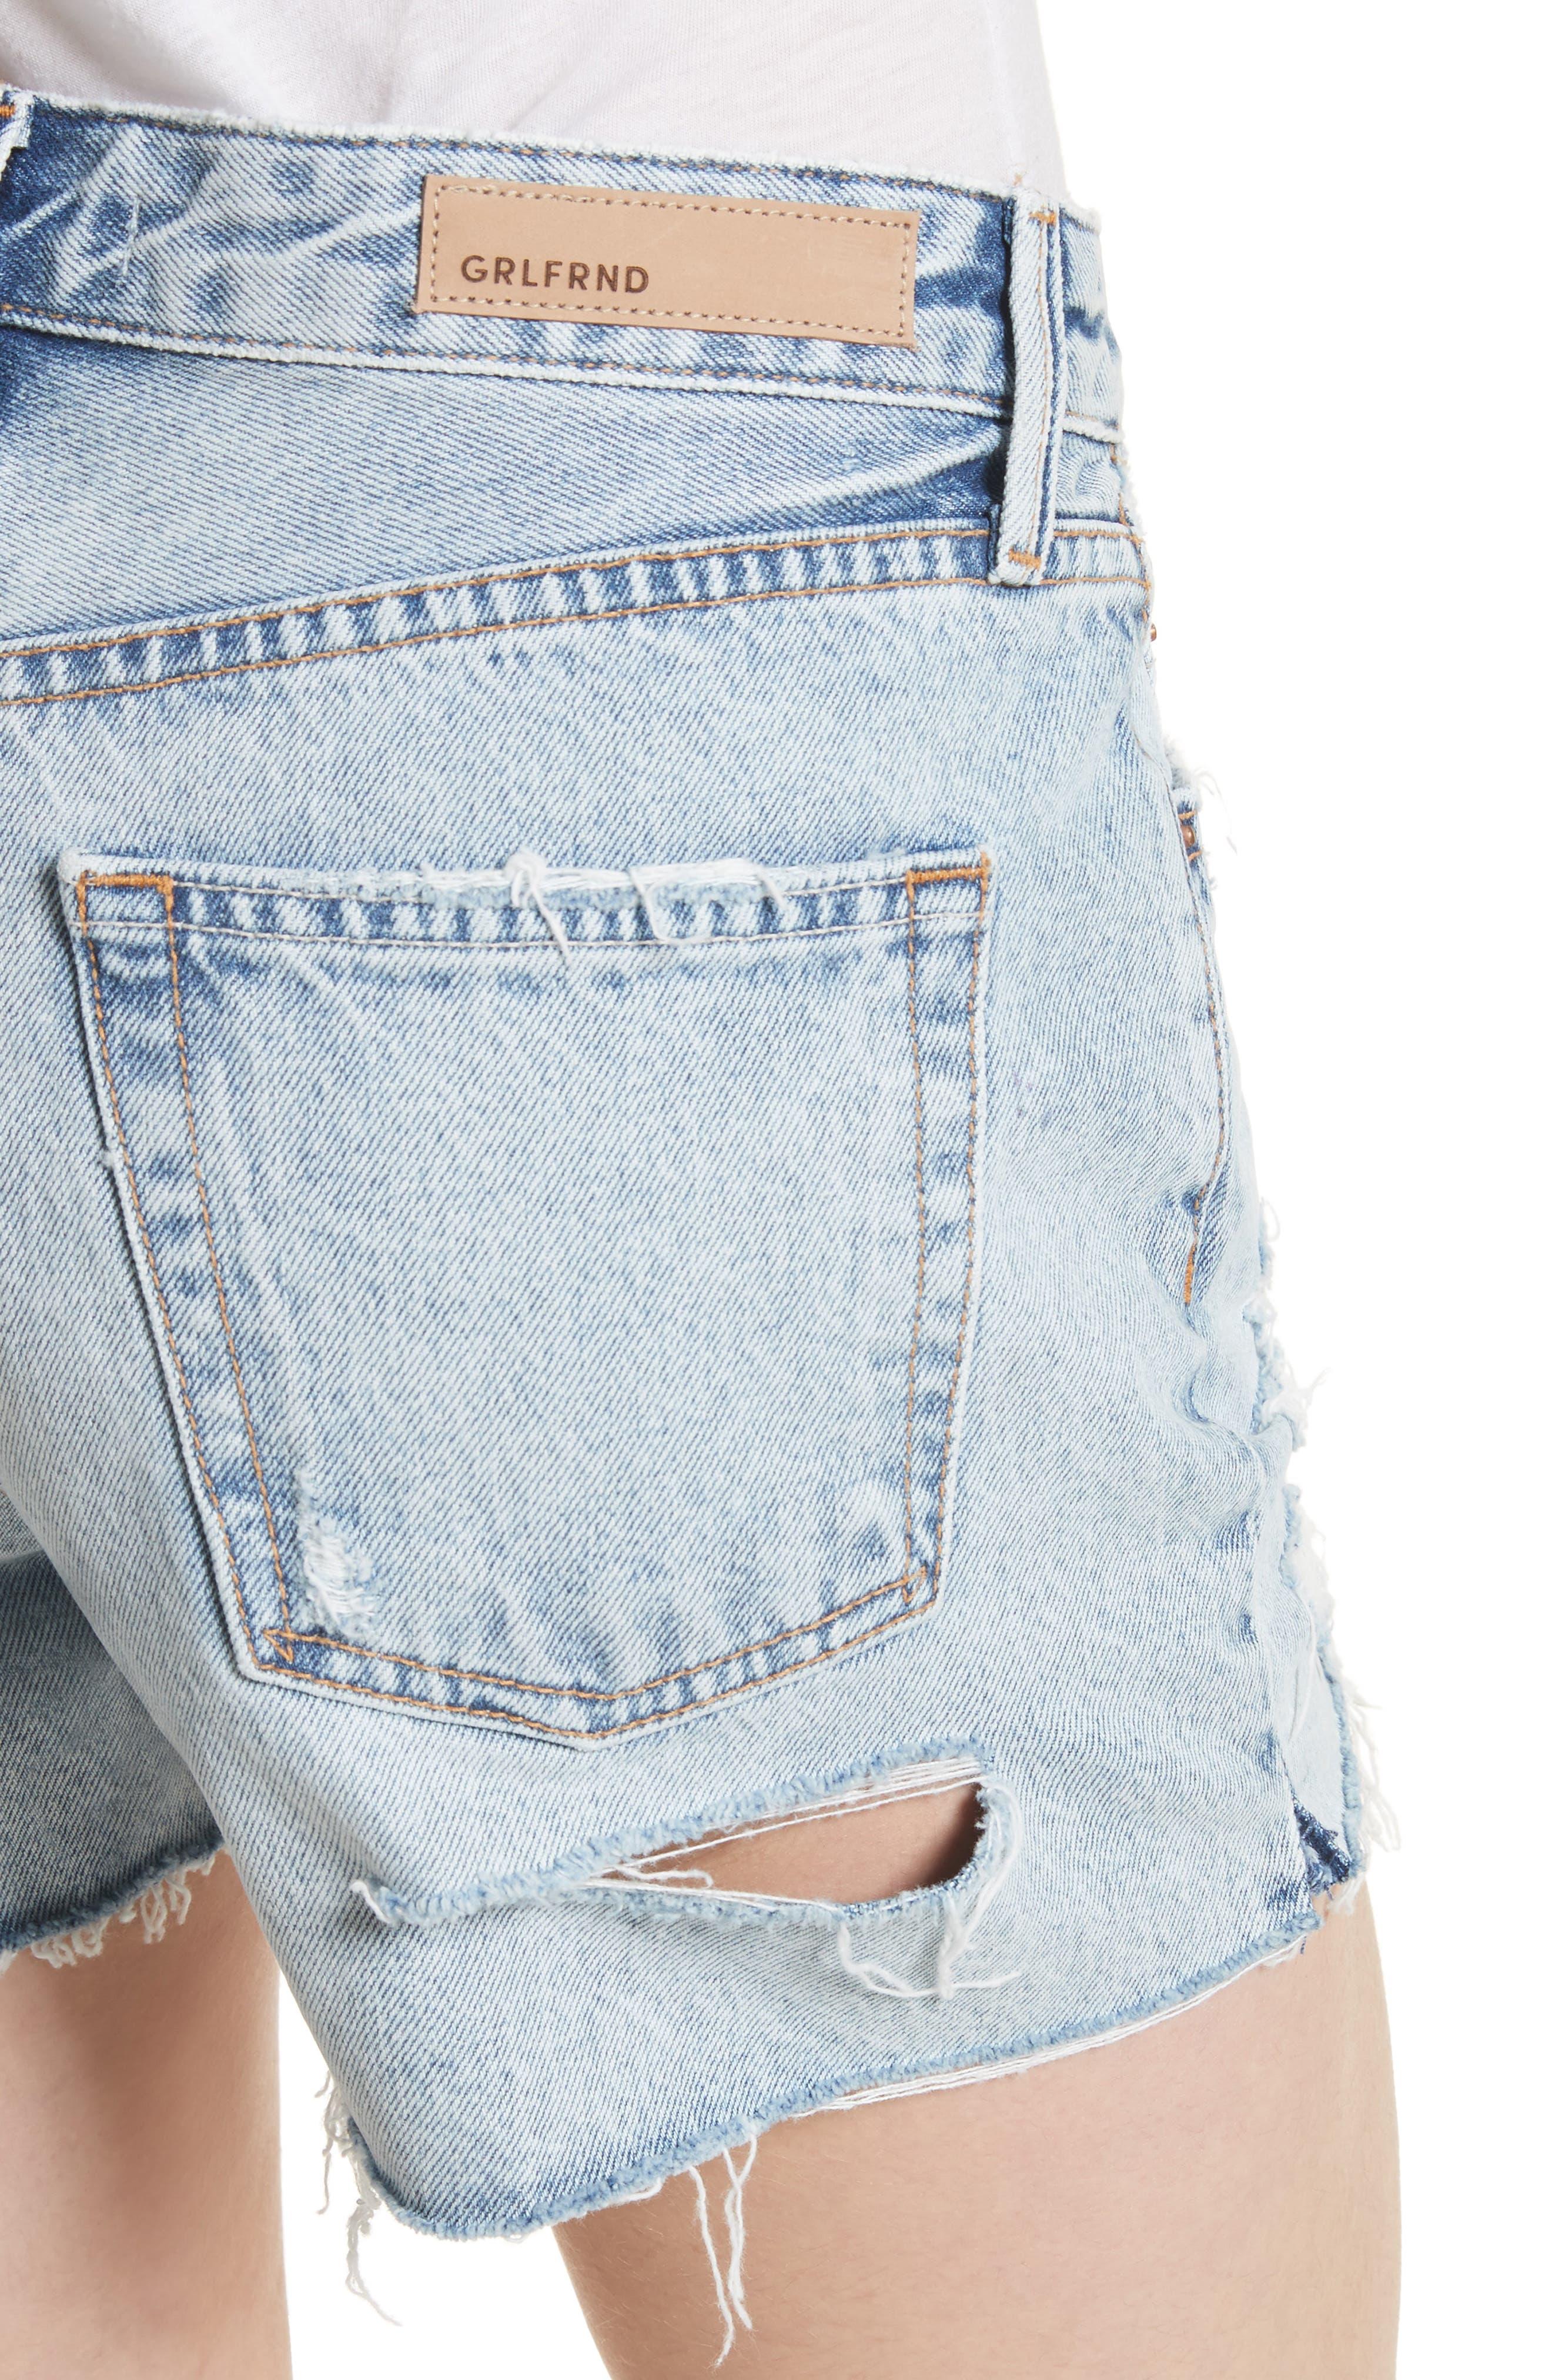 Helena Ripped Denim Shorts,                             Alternate thumbnail 4, color,                             Acetone